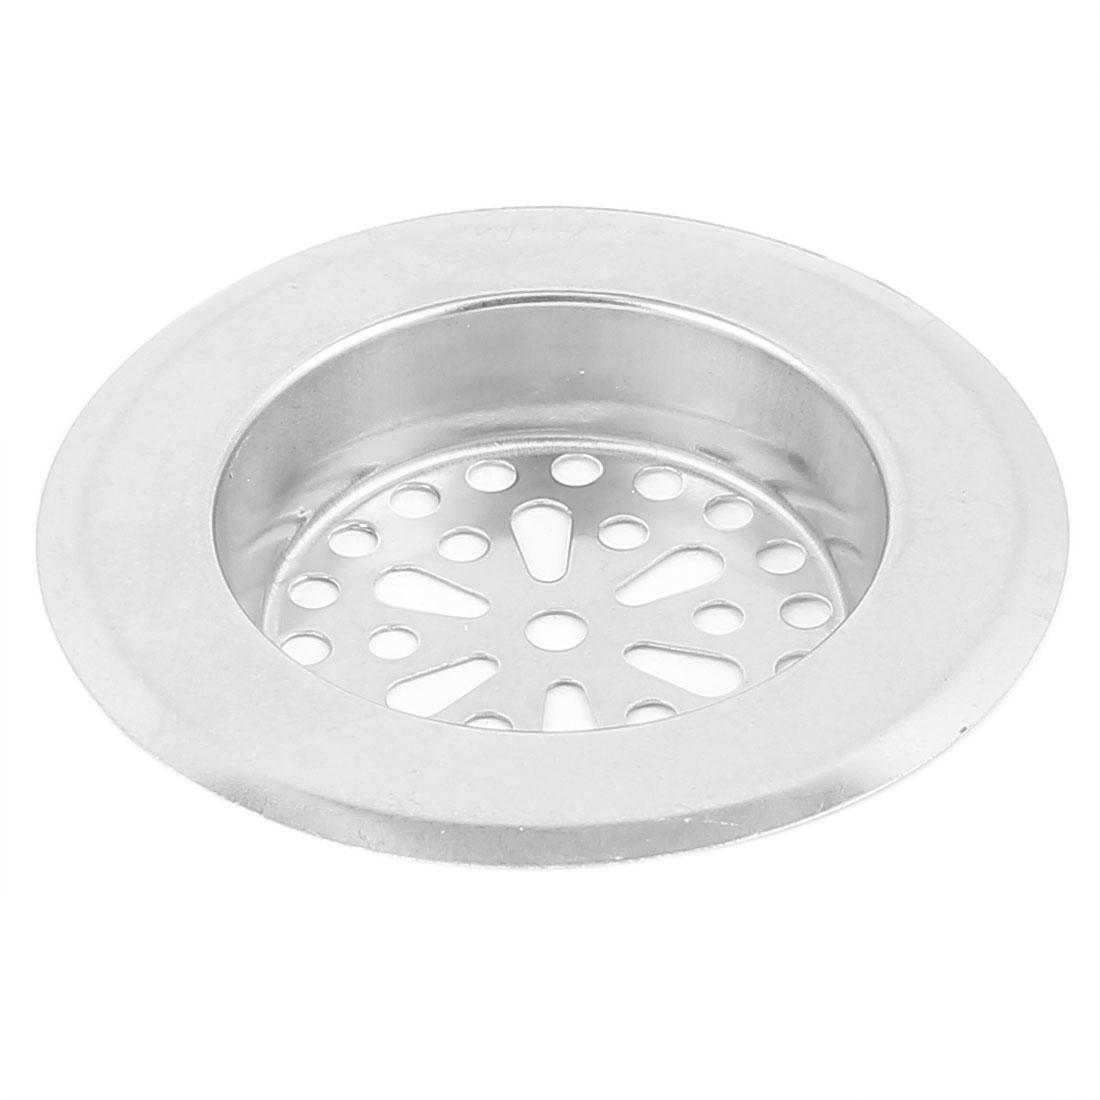 Bathroom Kitchen Stainless Steel Sink Strainer Drainer Filter Stopper 80mm Top Dia